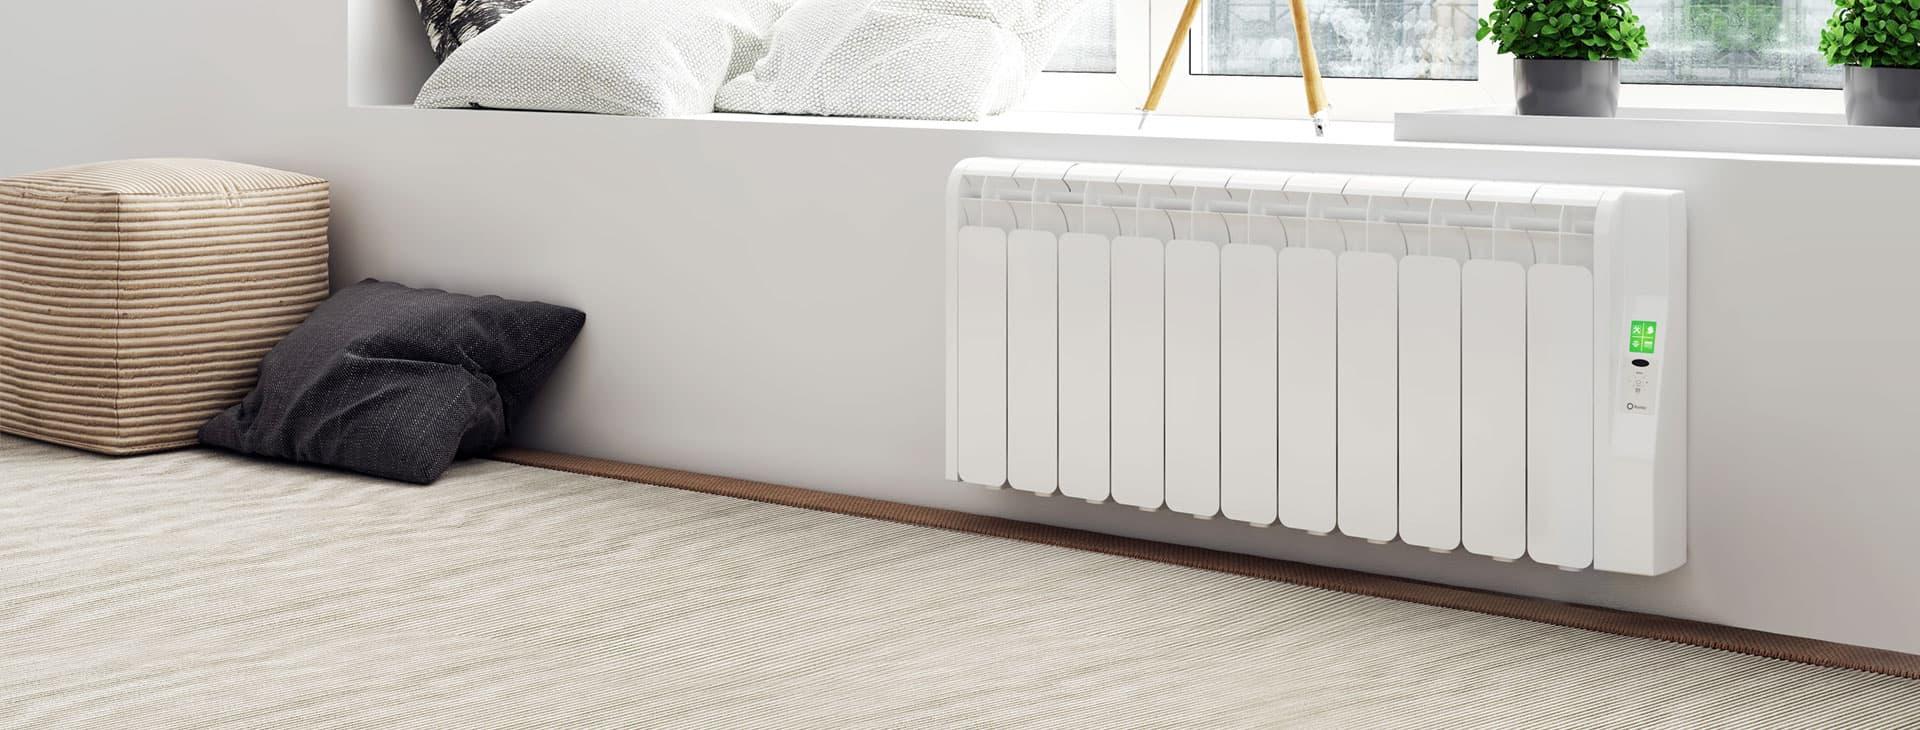 Rointe Kyros short conservatory radiator wall mounted under wall